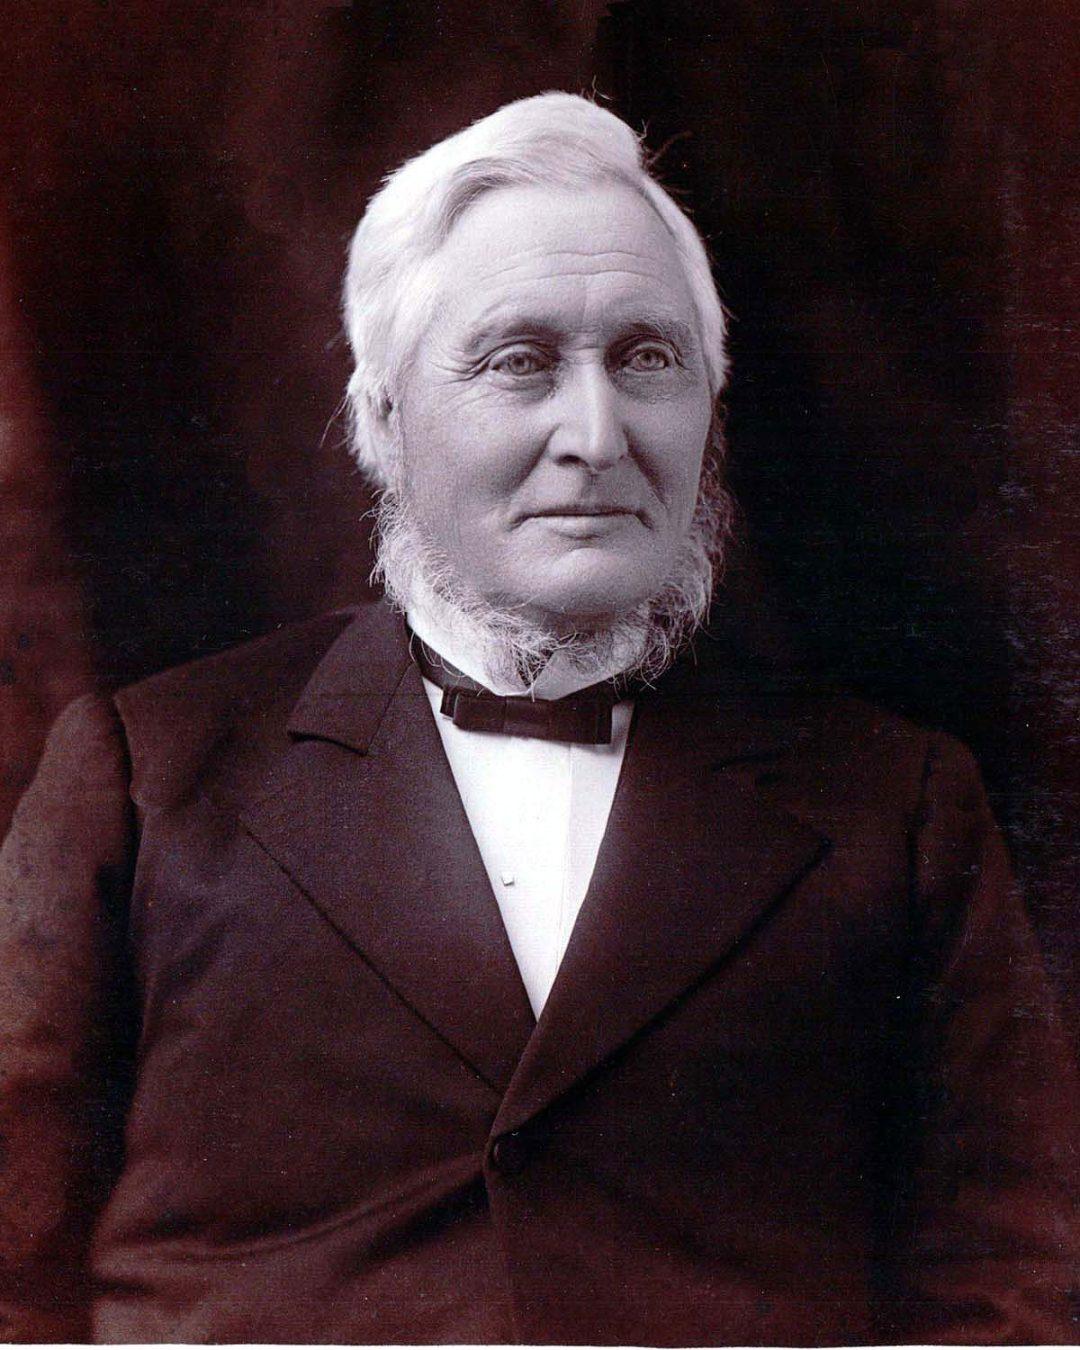 Joshua Pierce, born September 15, 1814